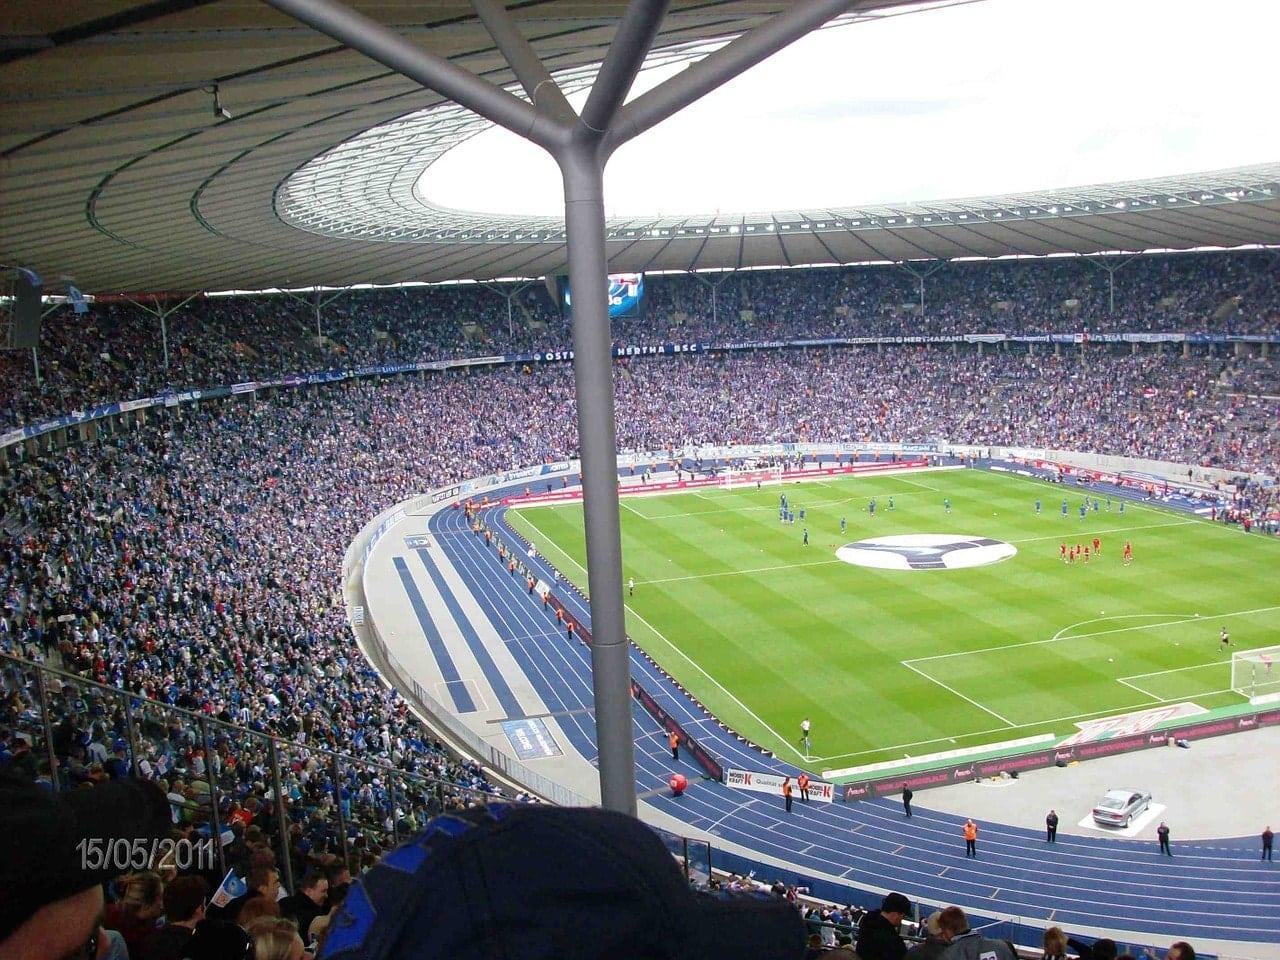 olympic-stadium-berliner-umschau-beste-rueckrunde-aller-zeiten